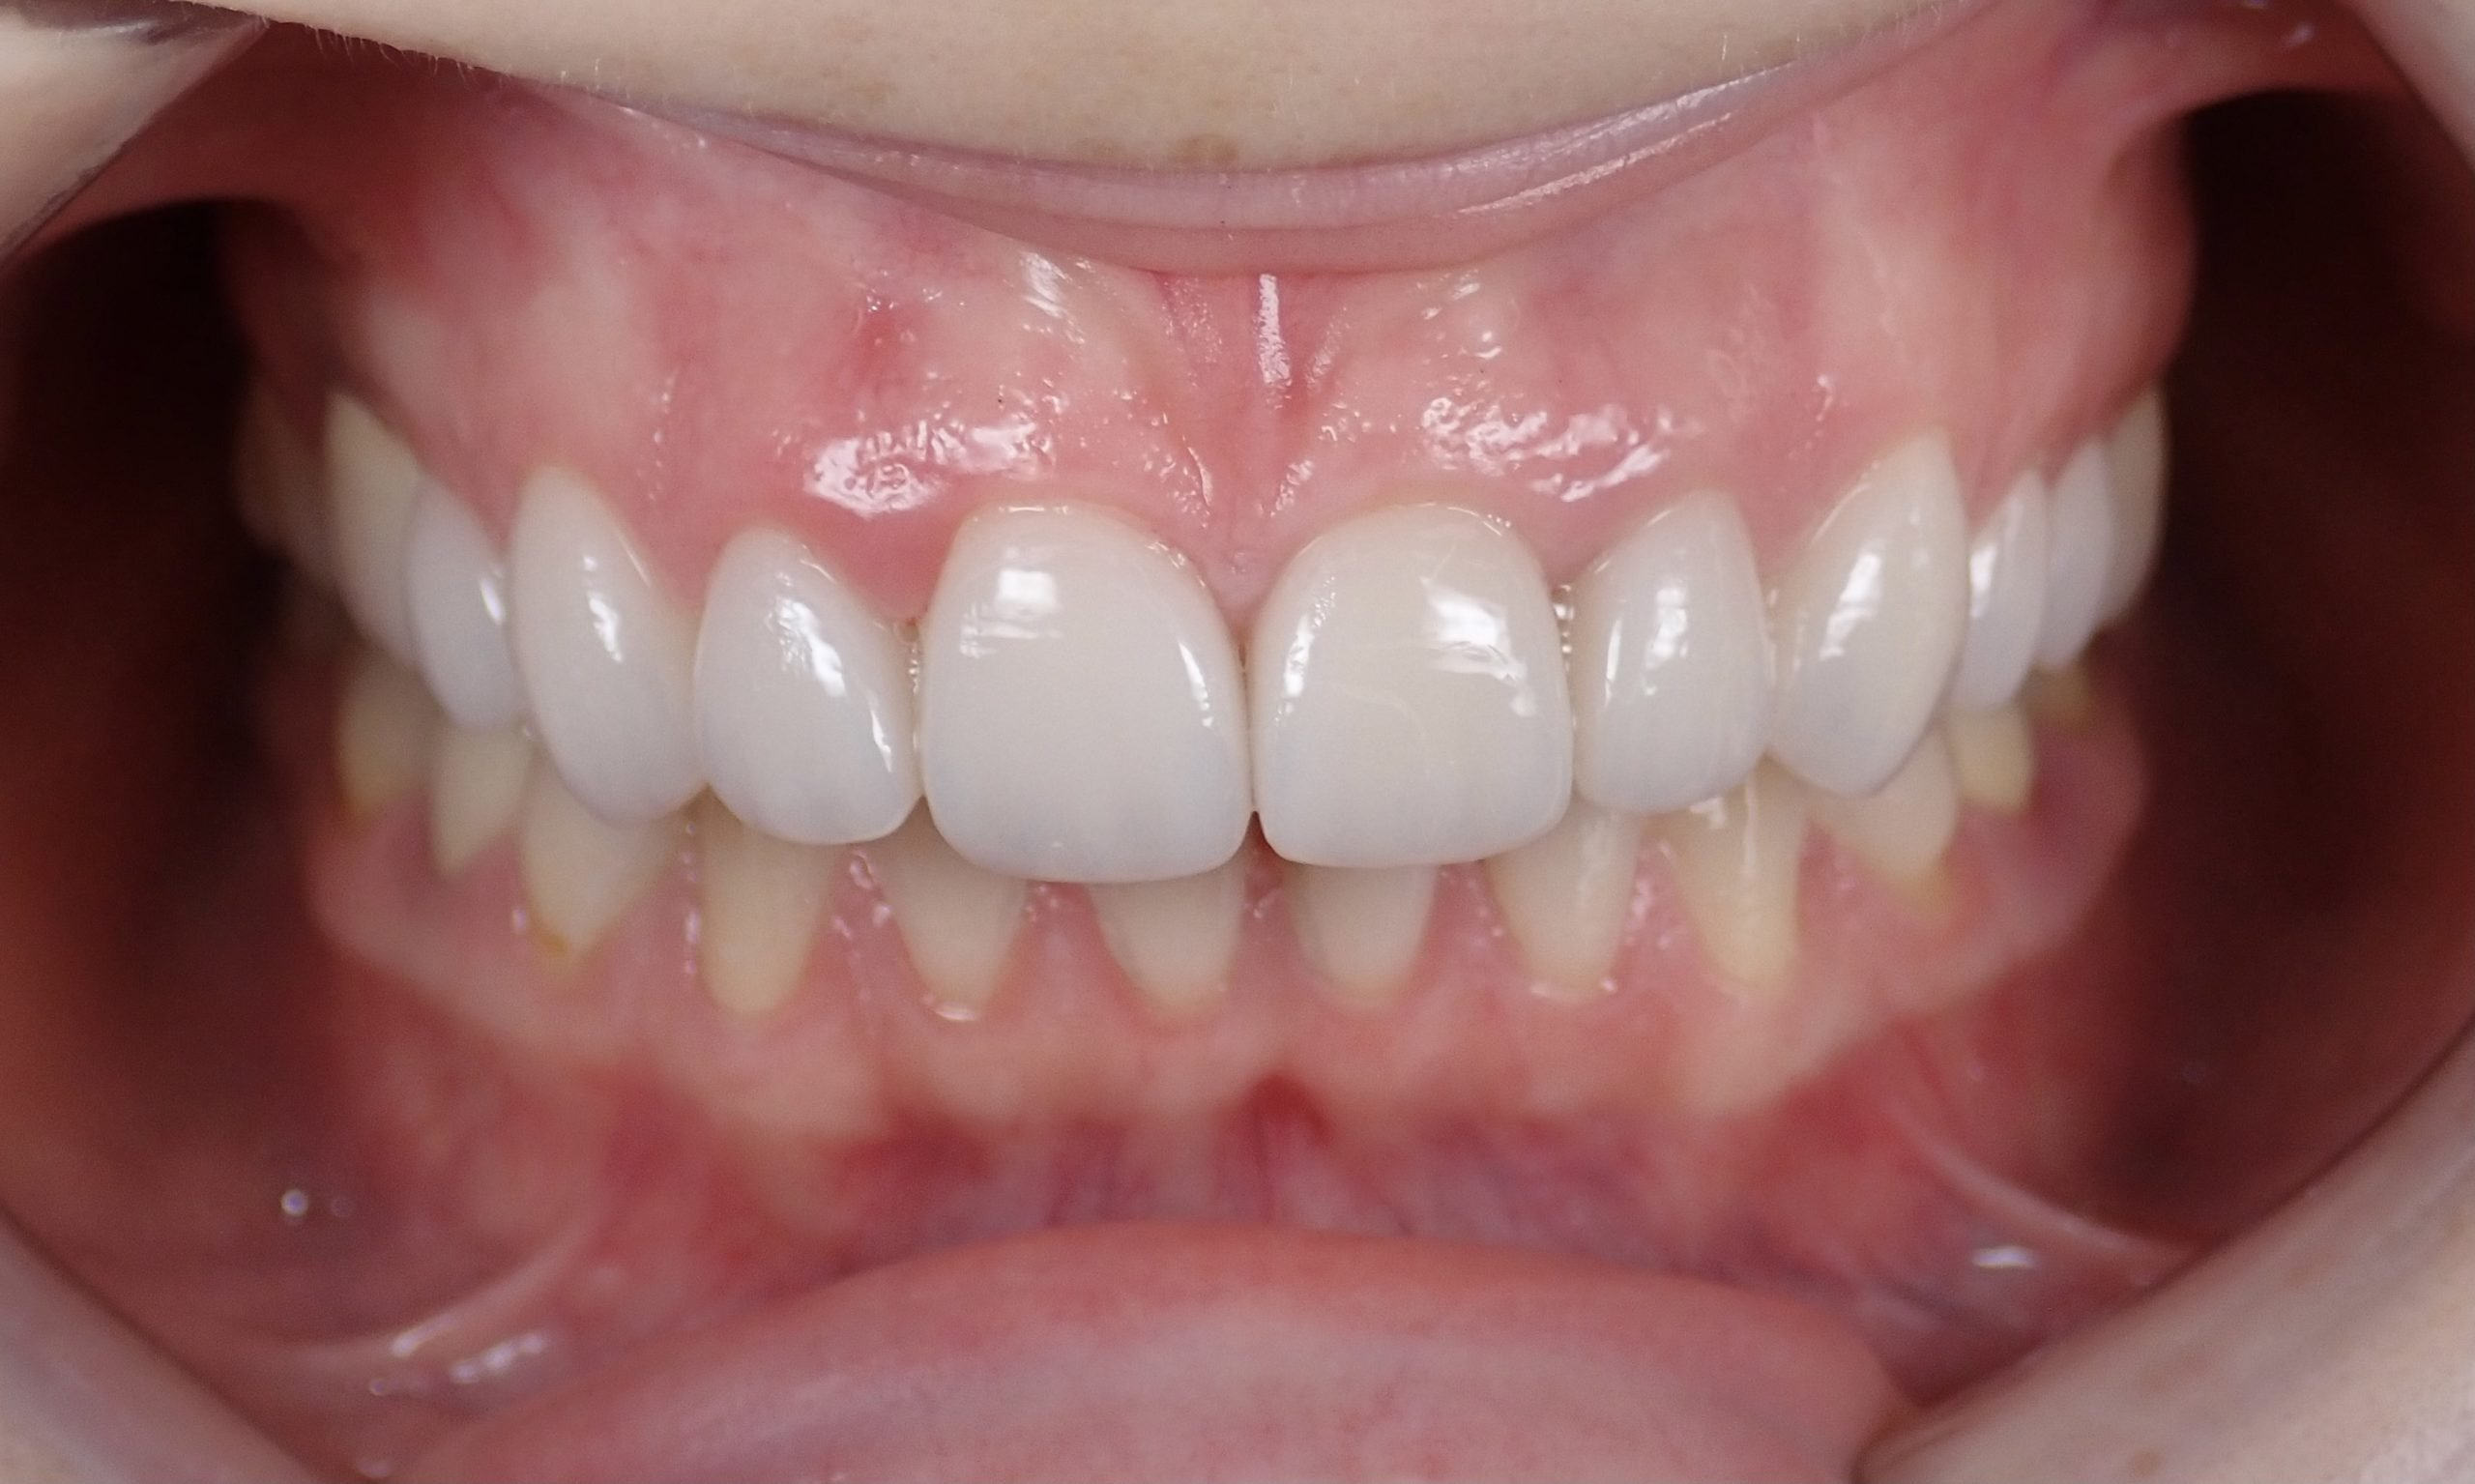 sunset dental bali portofolio After A